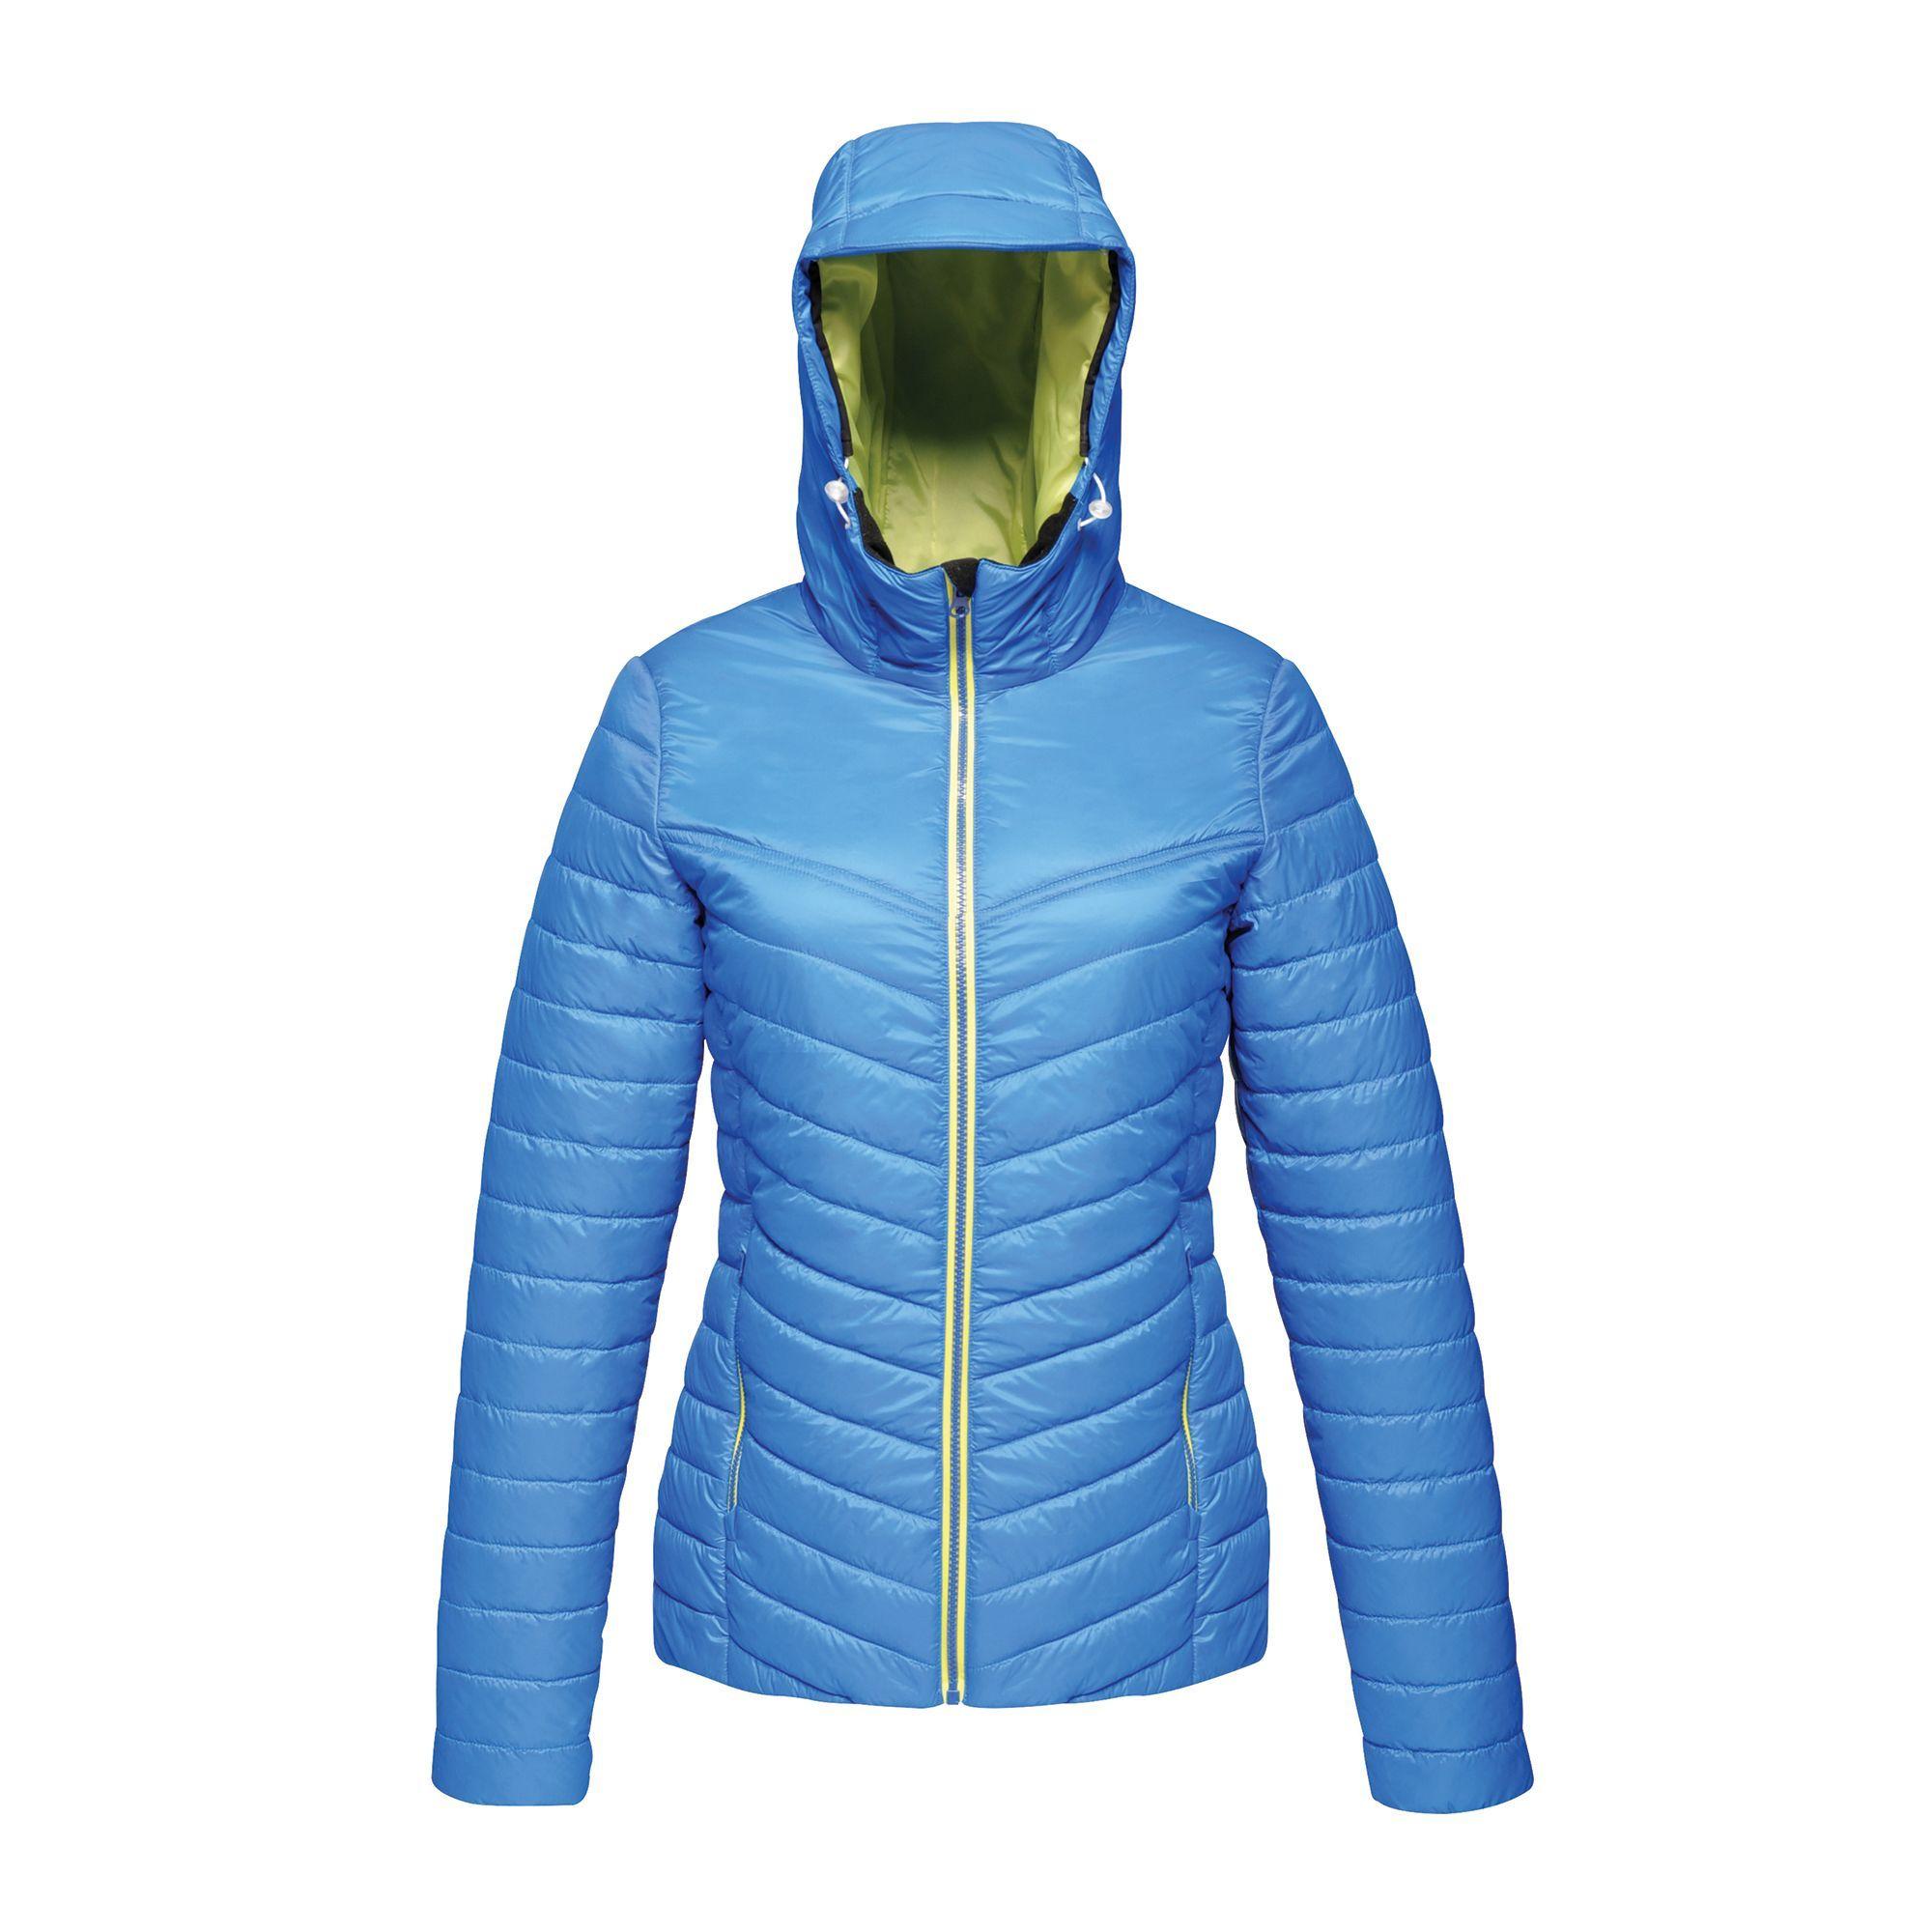 Regatta Womens/Ladies Acadia II Jacket (18 UK) (Oxford Blue/Neon Spring)